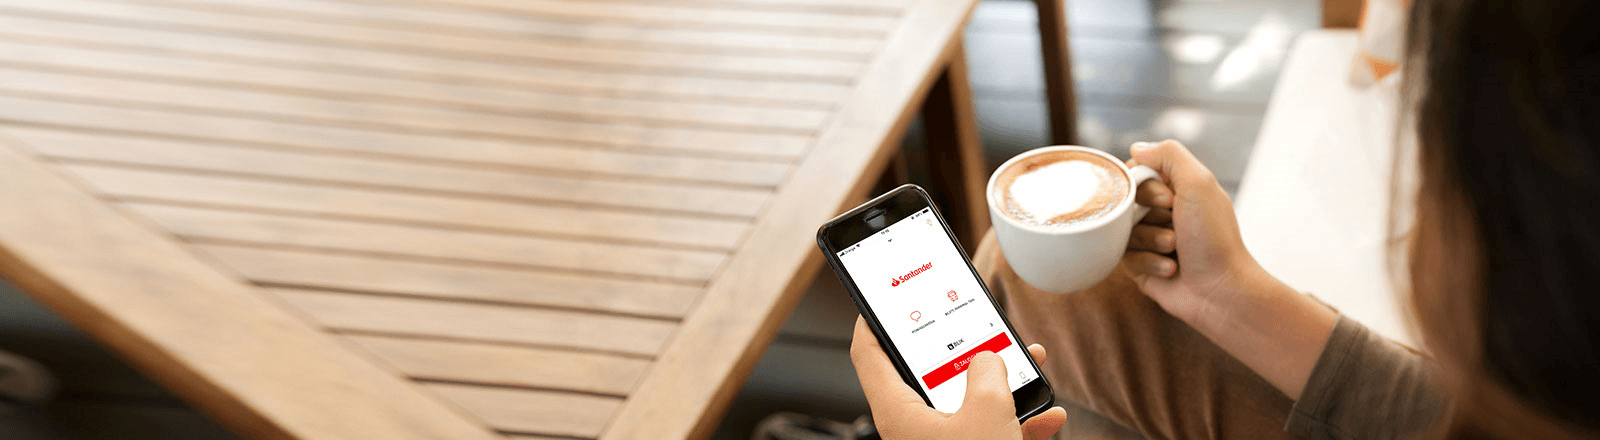 Aplikacja Santander Mobile